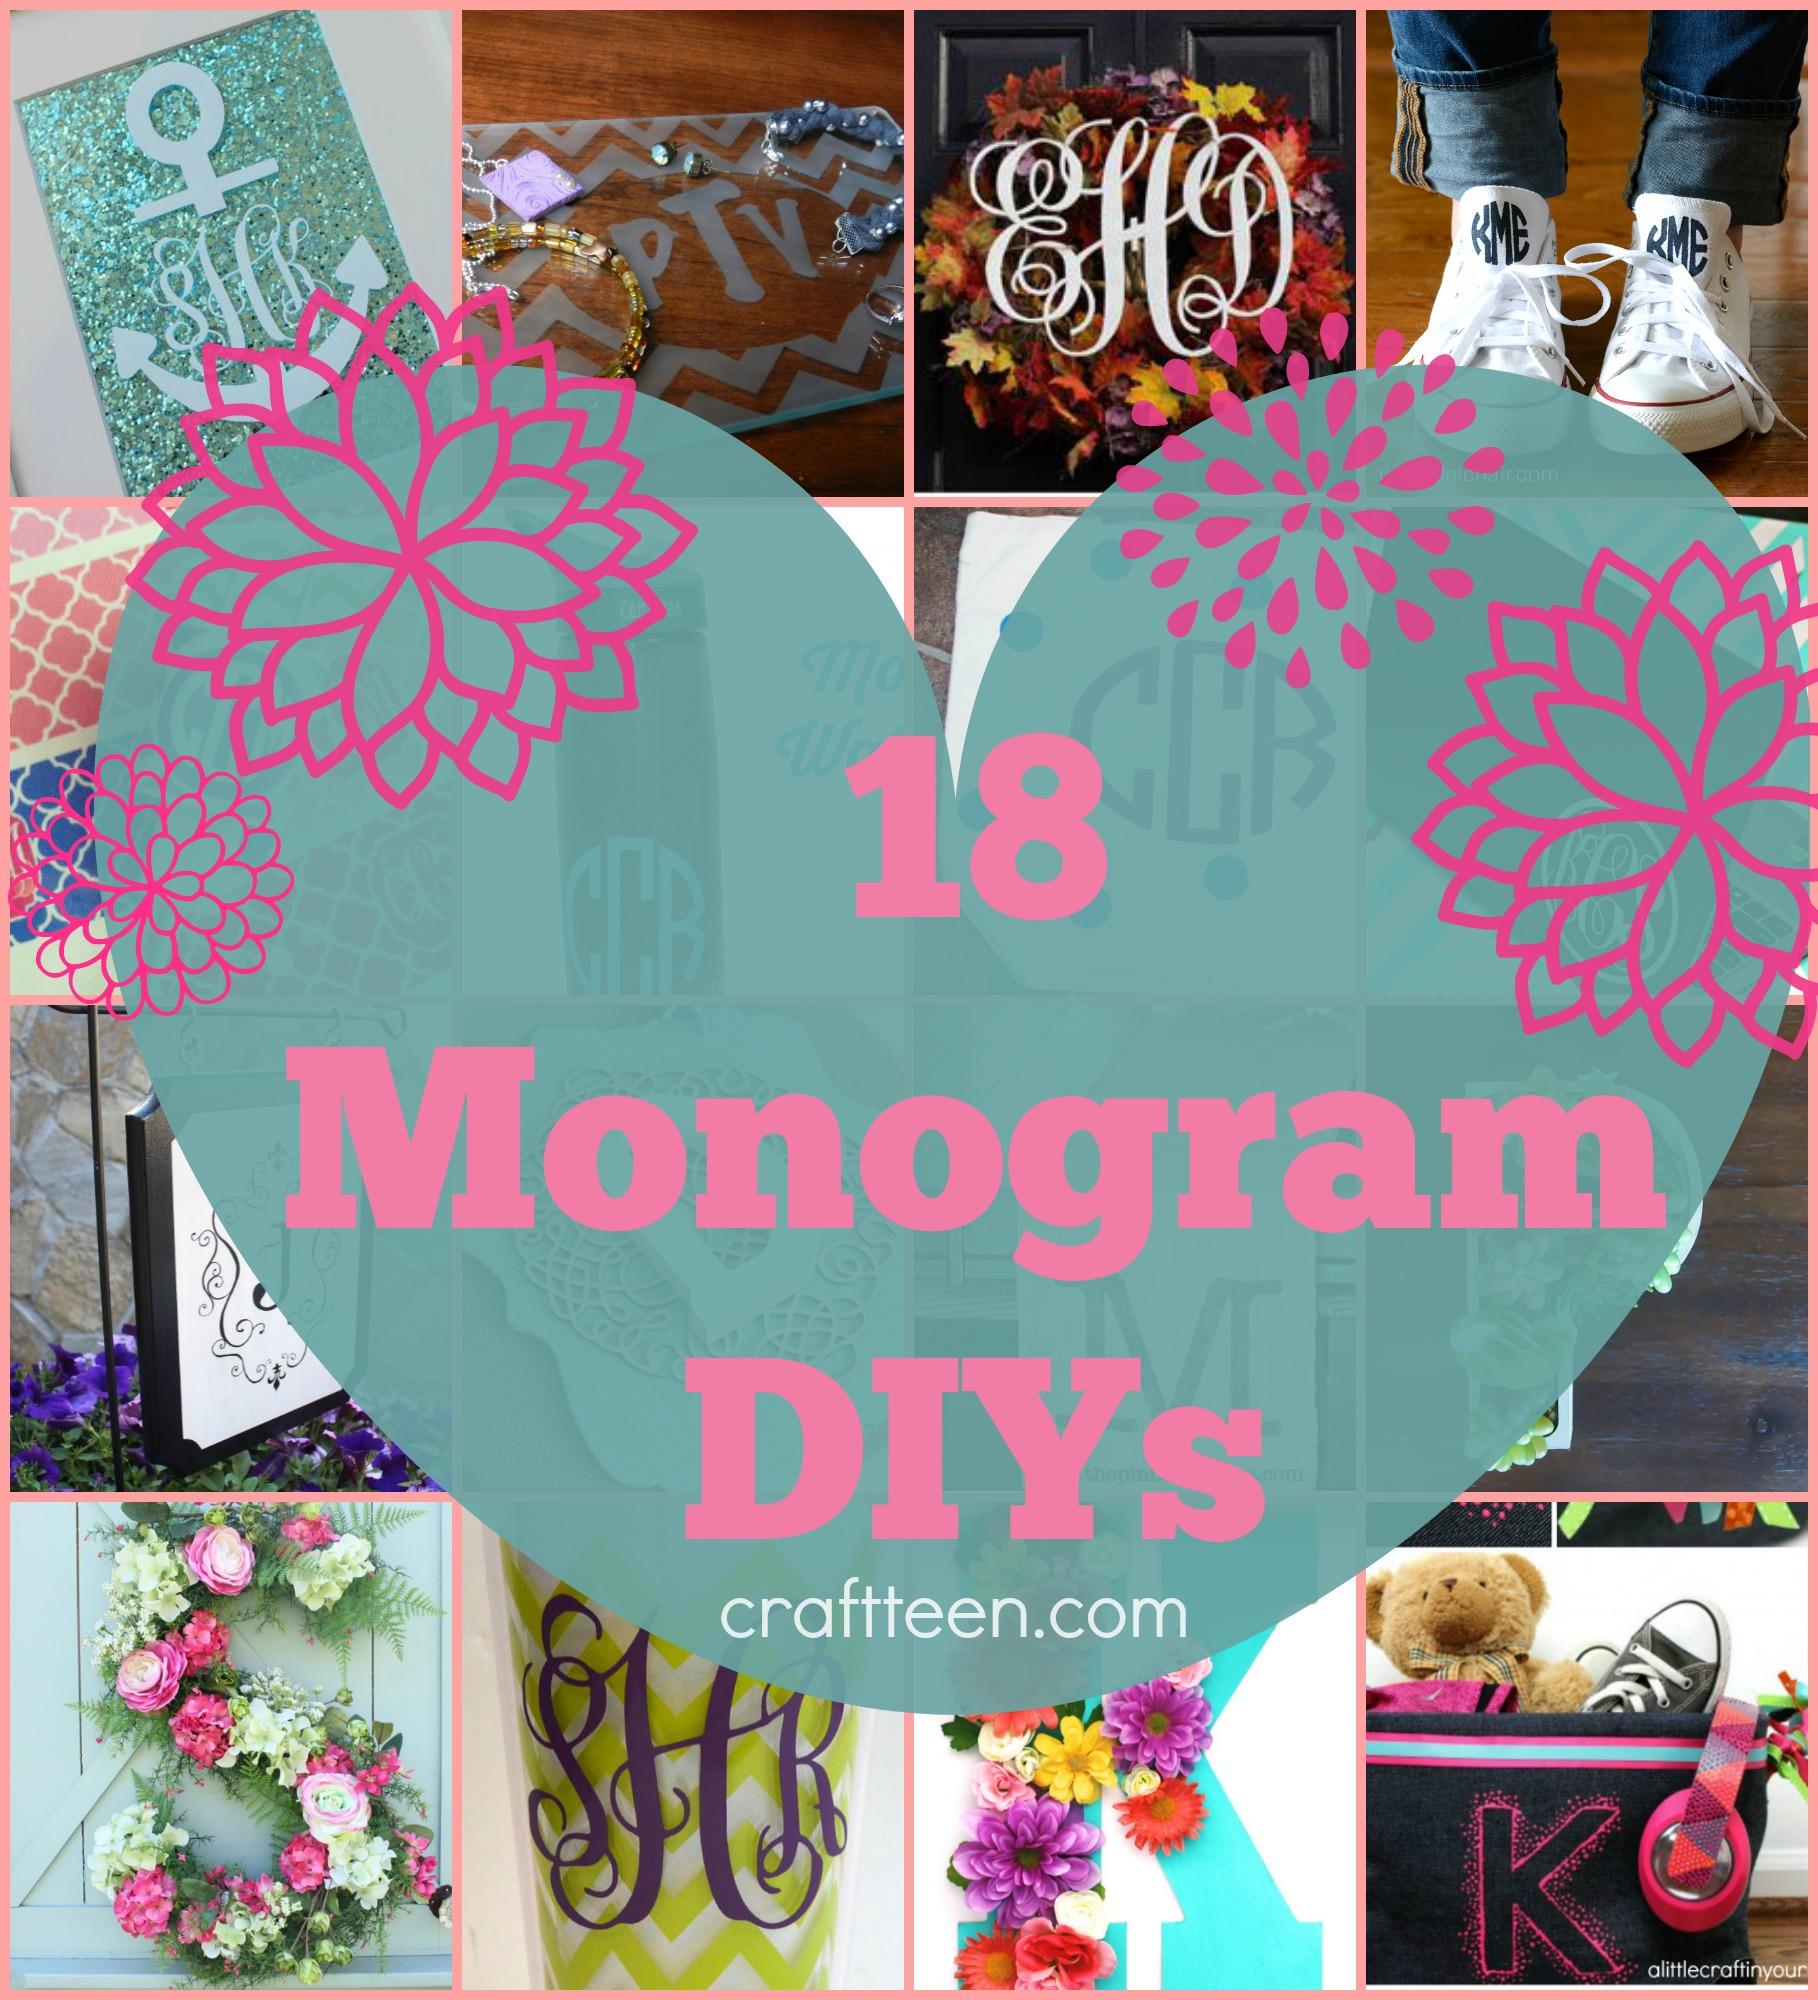 18_Monograms_DIYs